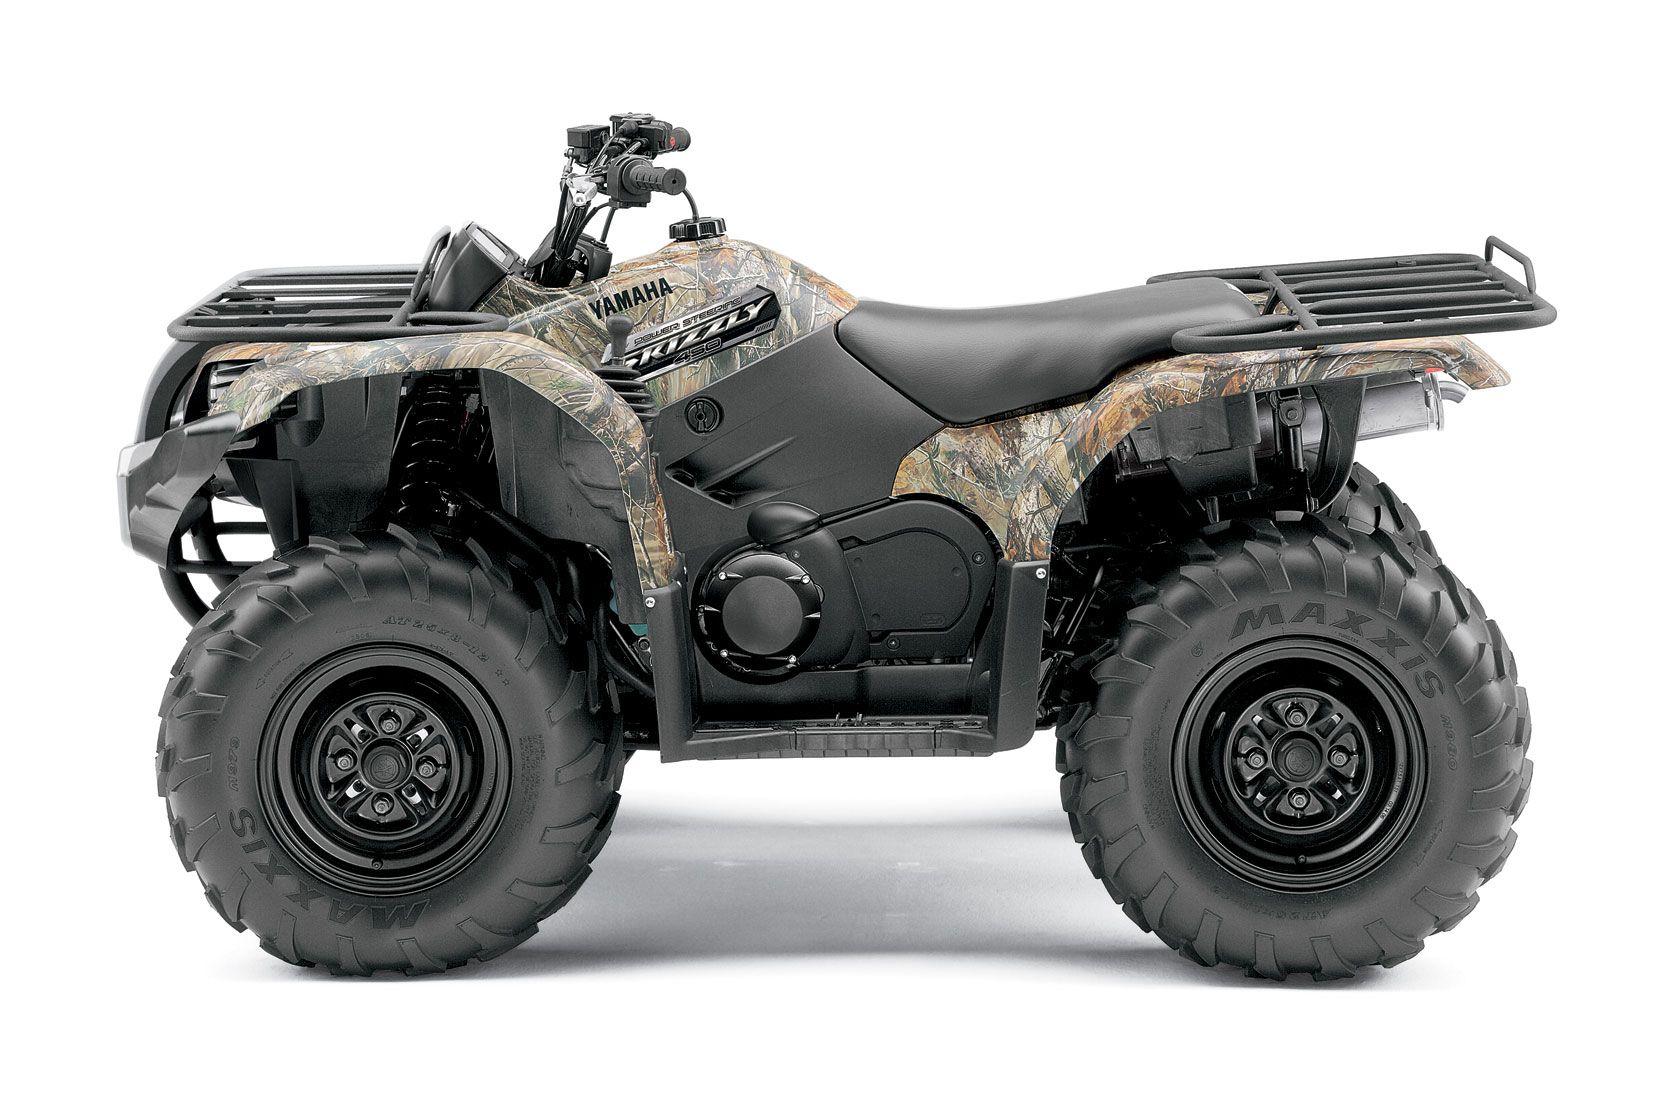 Yamaha Grizzly 450 >> Yamaha Grizzly 450 Auto 4x4 Off Grid Yamaha 4x4 Atv